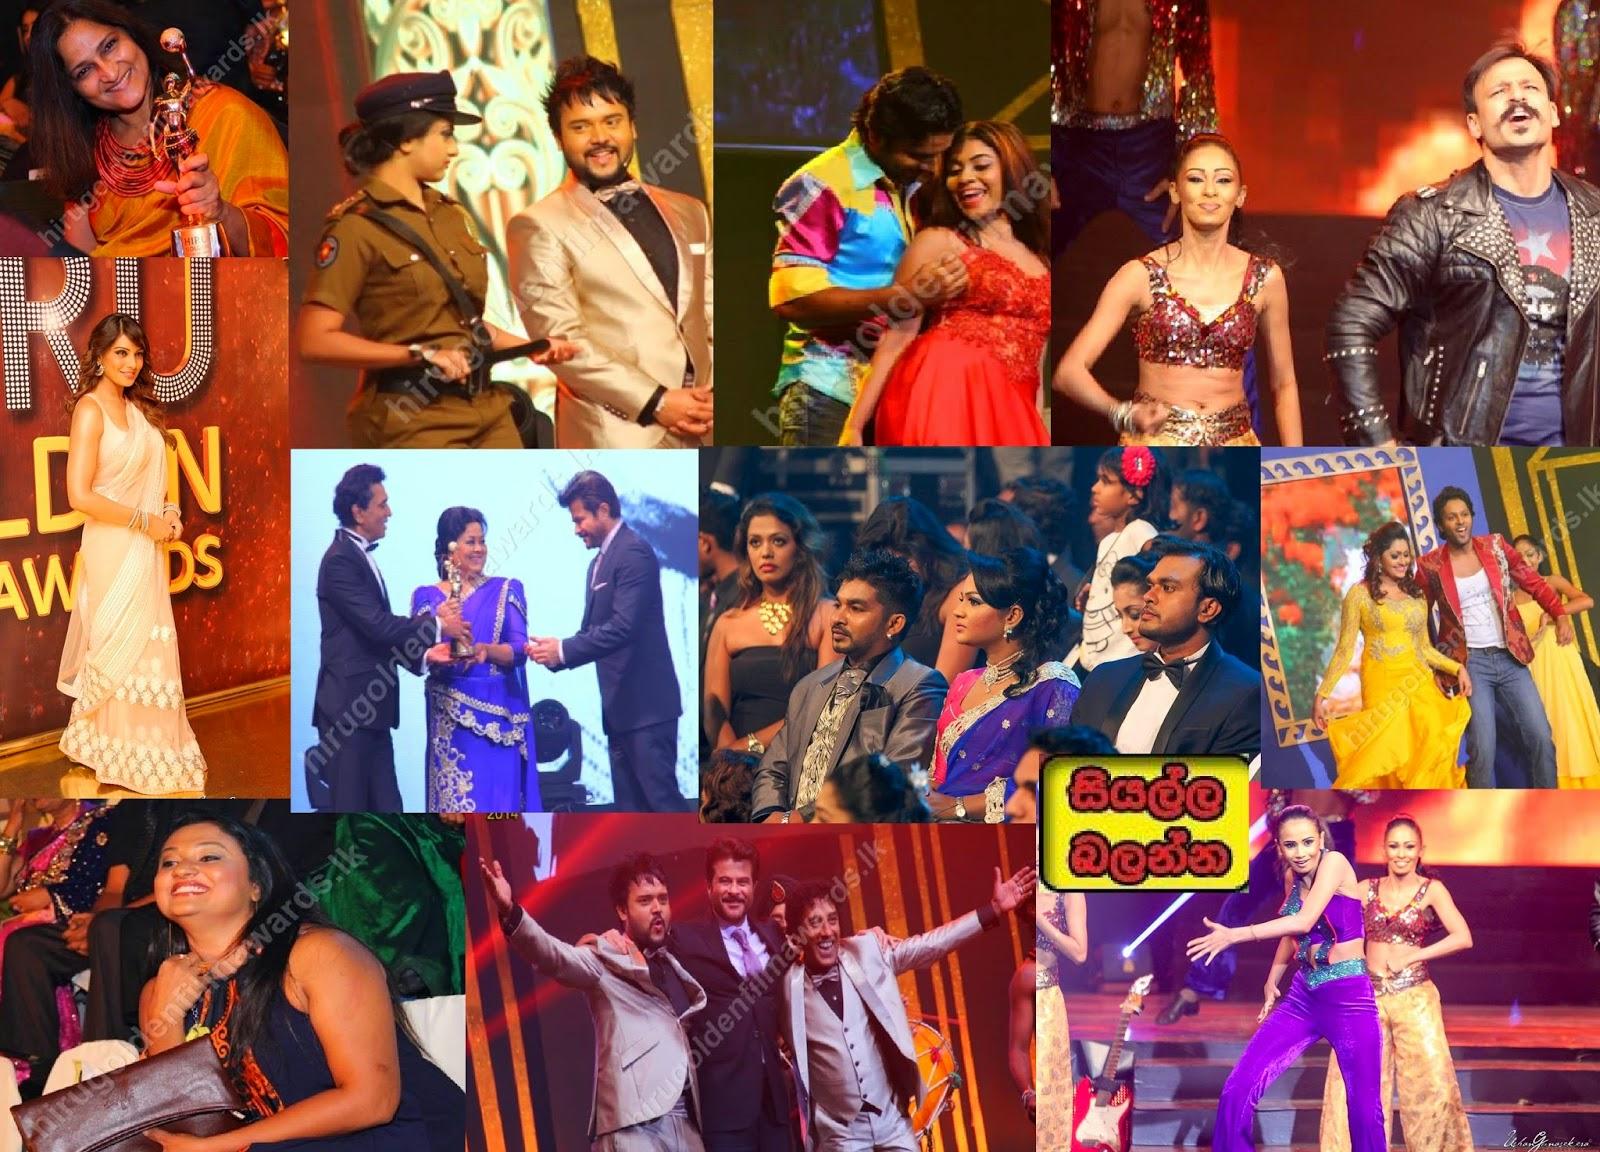 http://picture.gossiplankahotnews.com/2014/10/hiru-golden-film-awards-2014.html